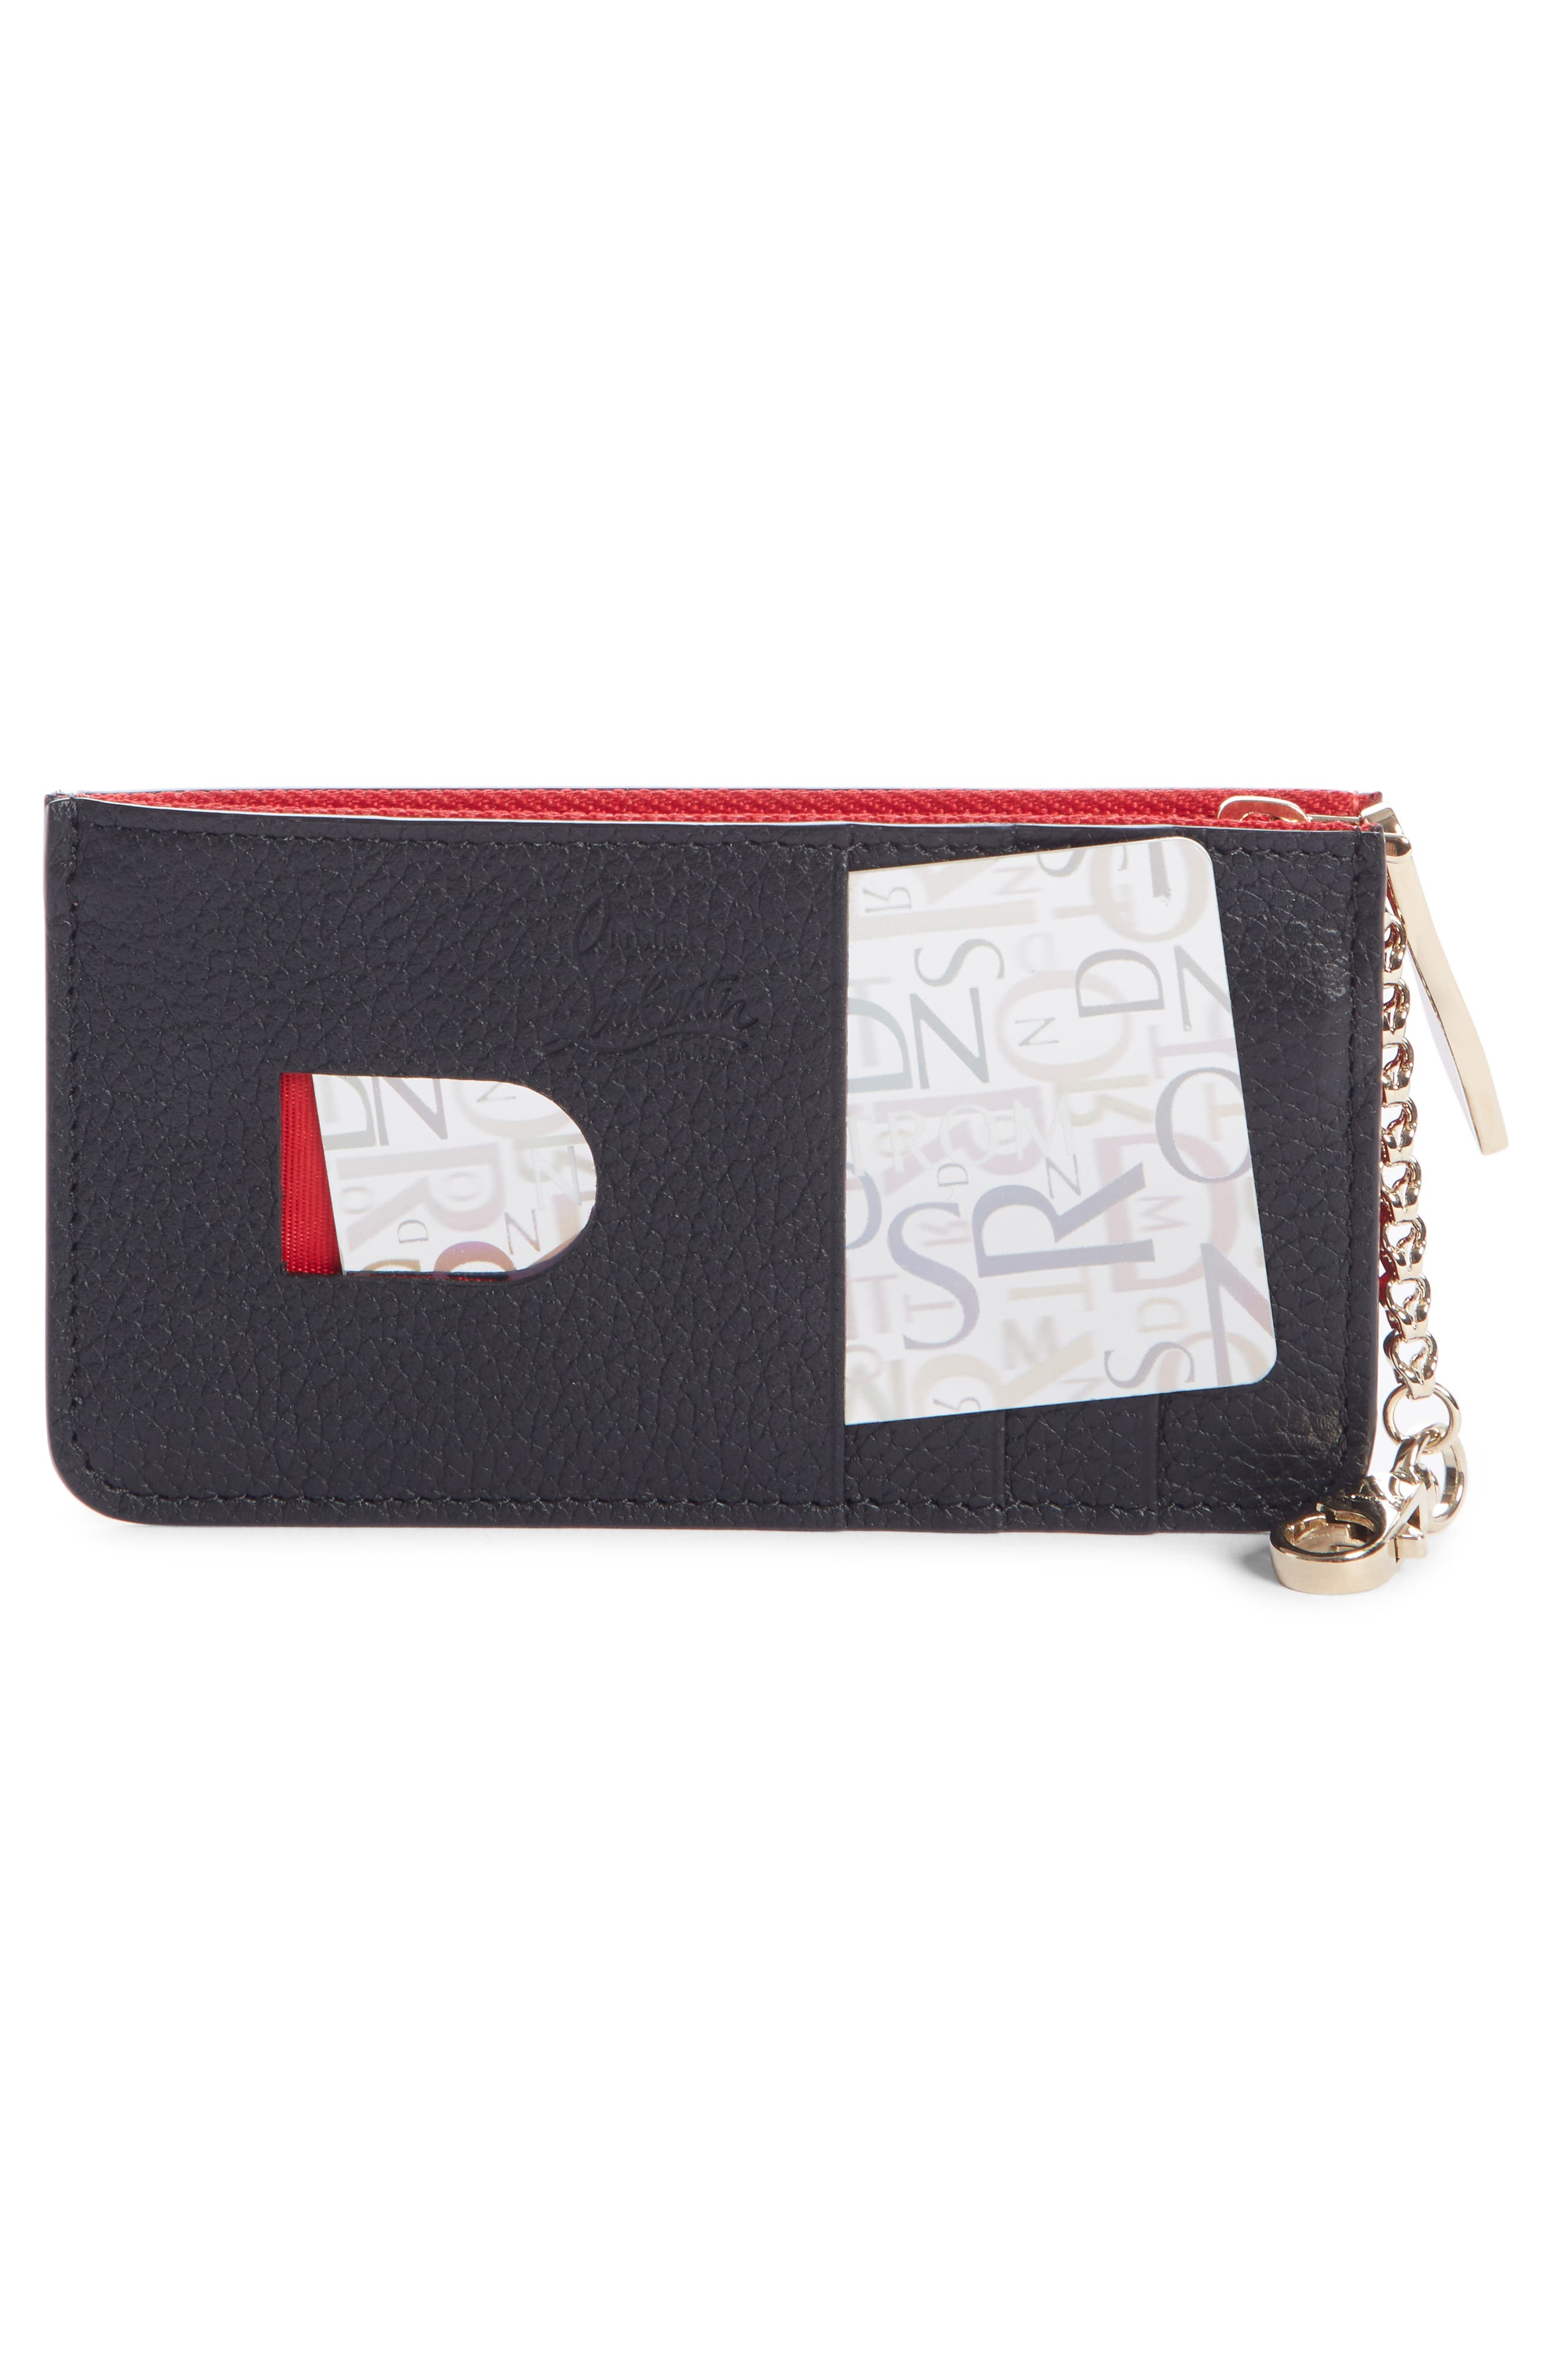 CHRISTIAN LOUBOUTIN, Credilou Calfskin Leather Zip Card Case, Alternate thumbnail 2, color, BLACK/ GOLD